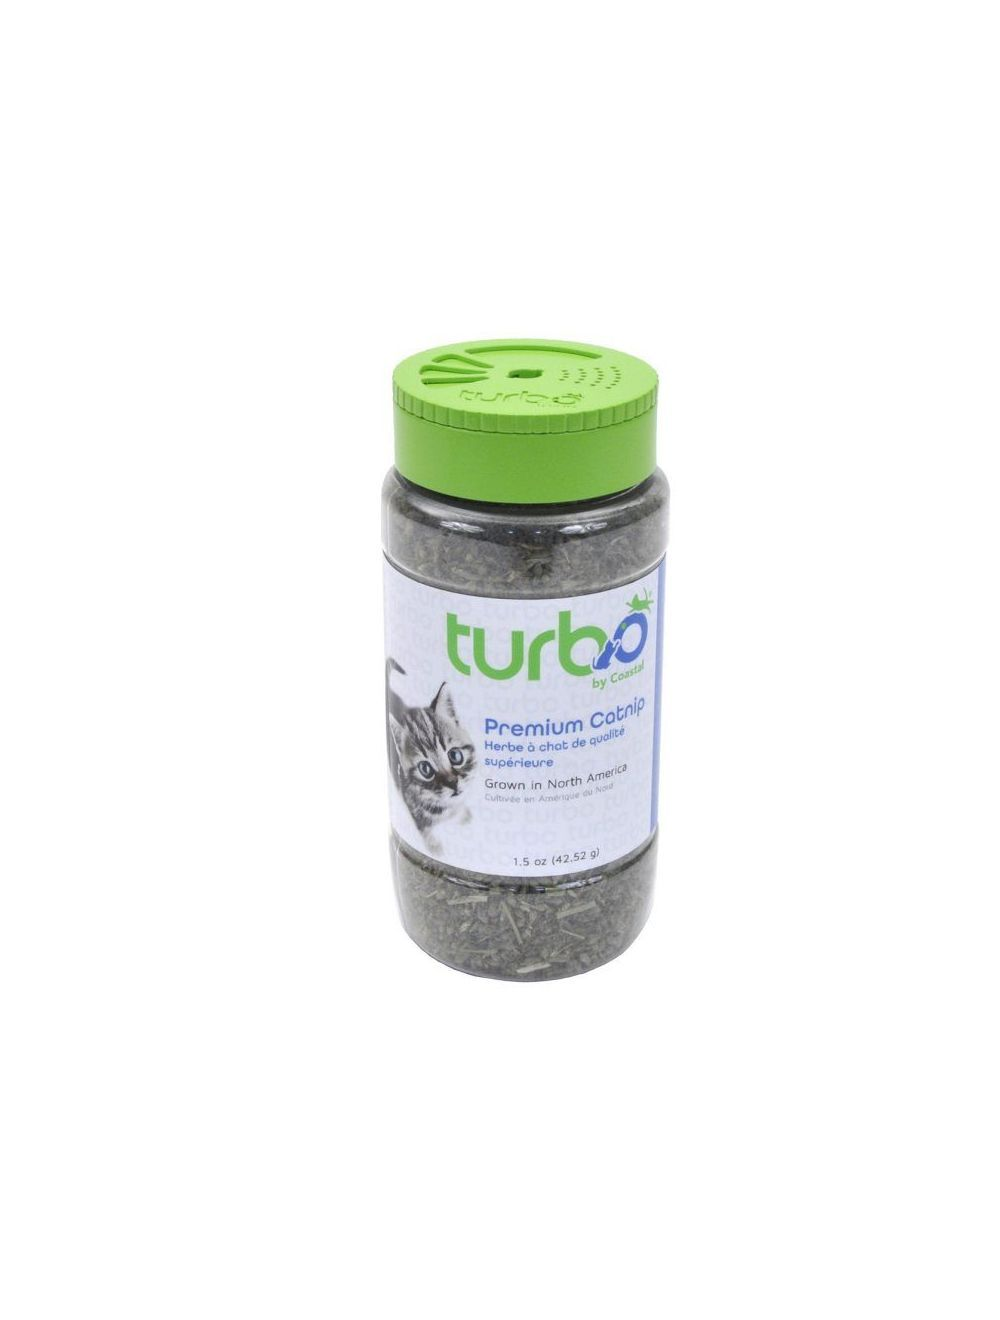 Turbo gato catnip dispensador 1.5 oz